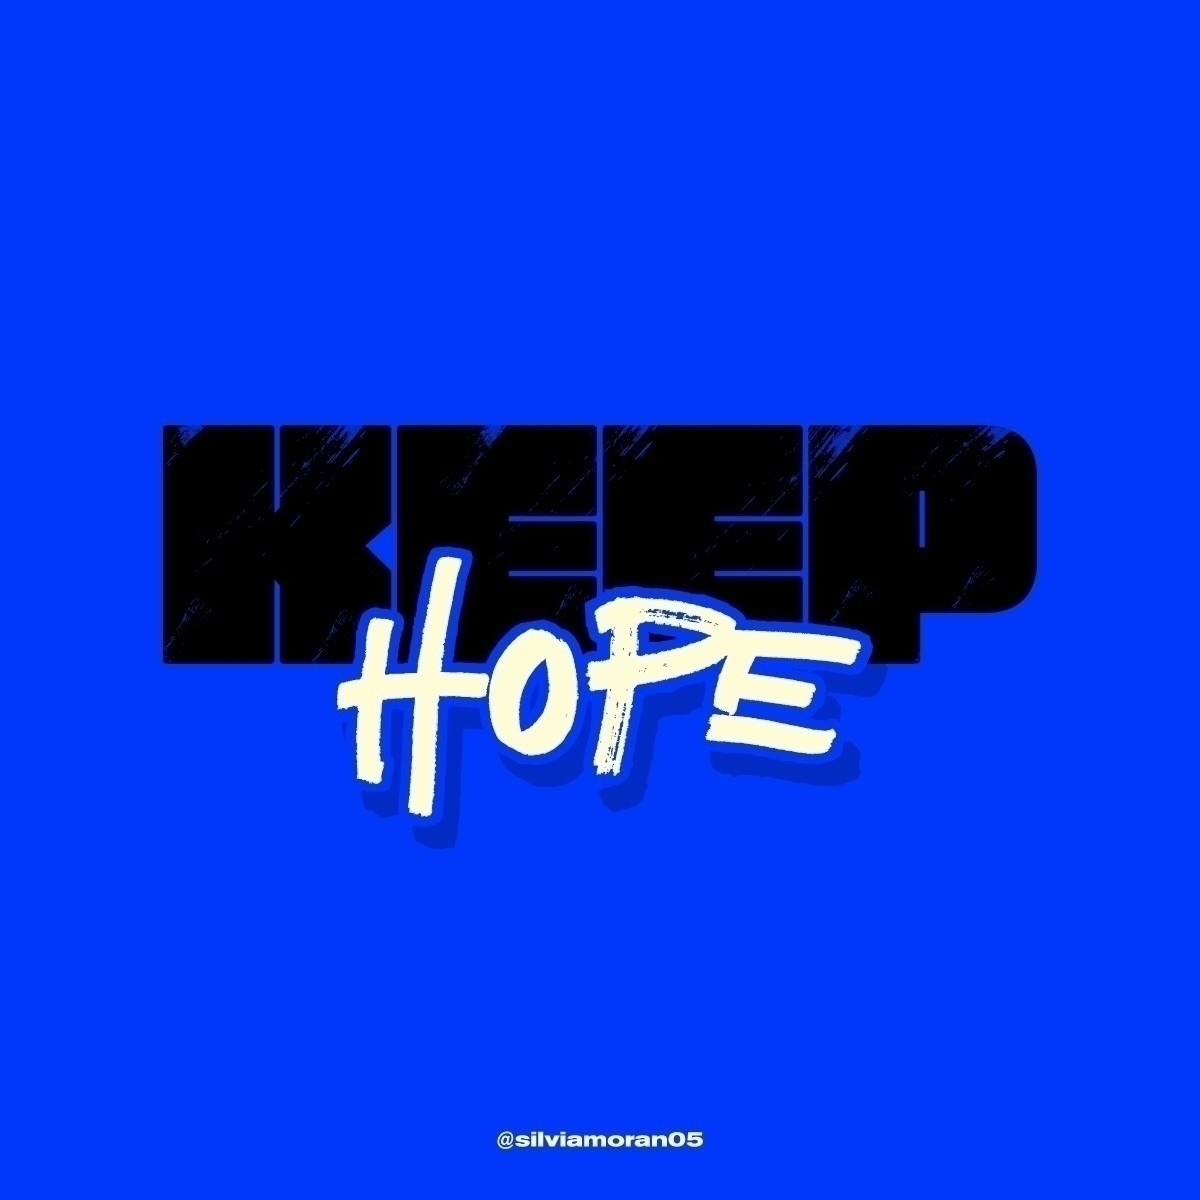 time hope - quarantine, stayhome - silviamoran05 | ello